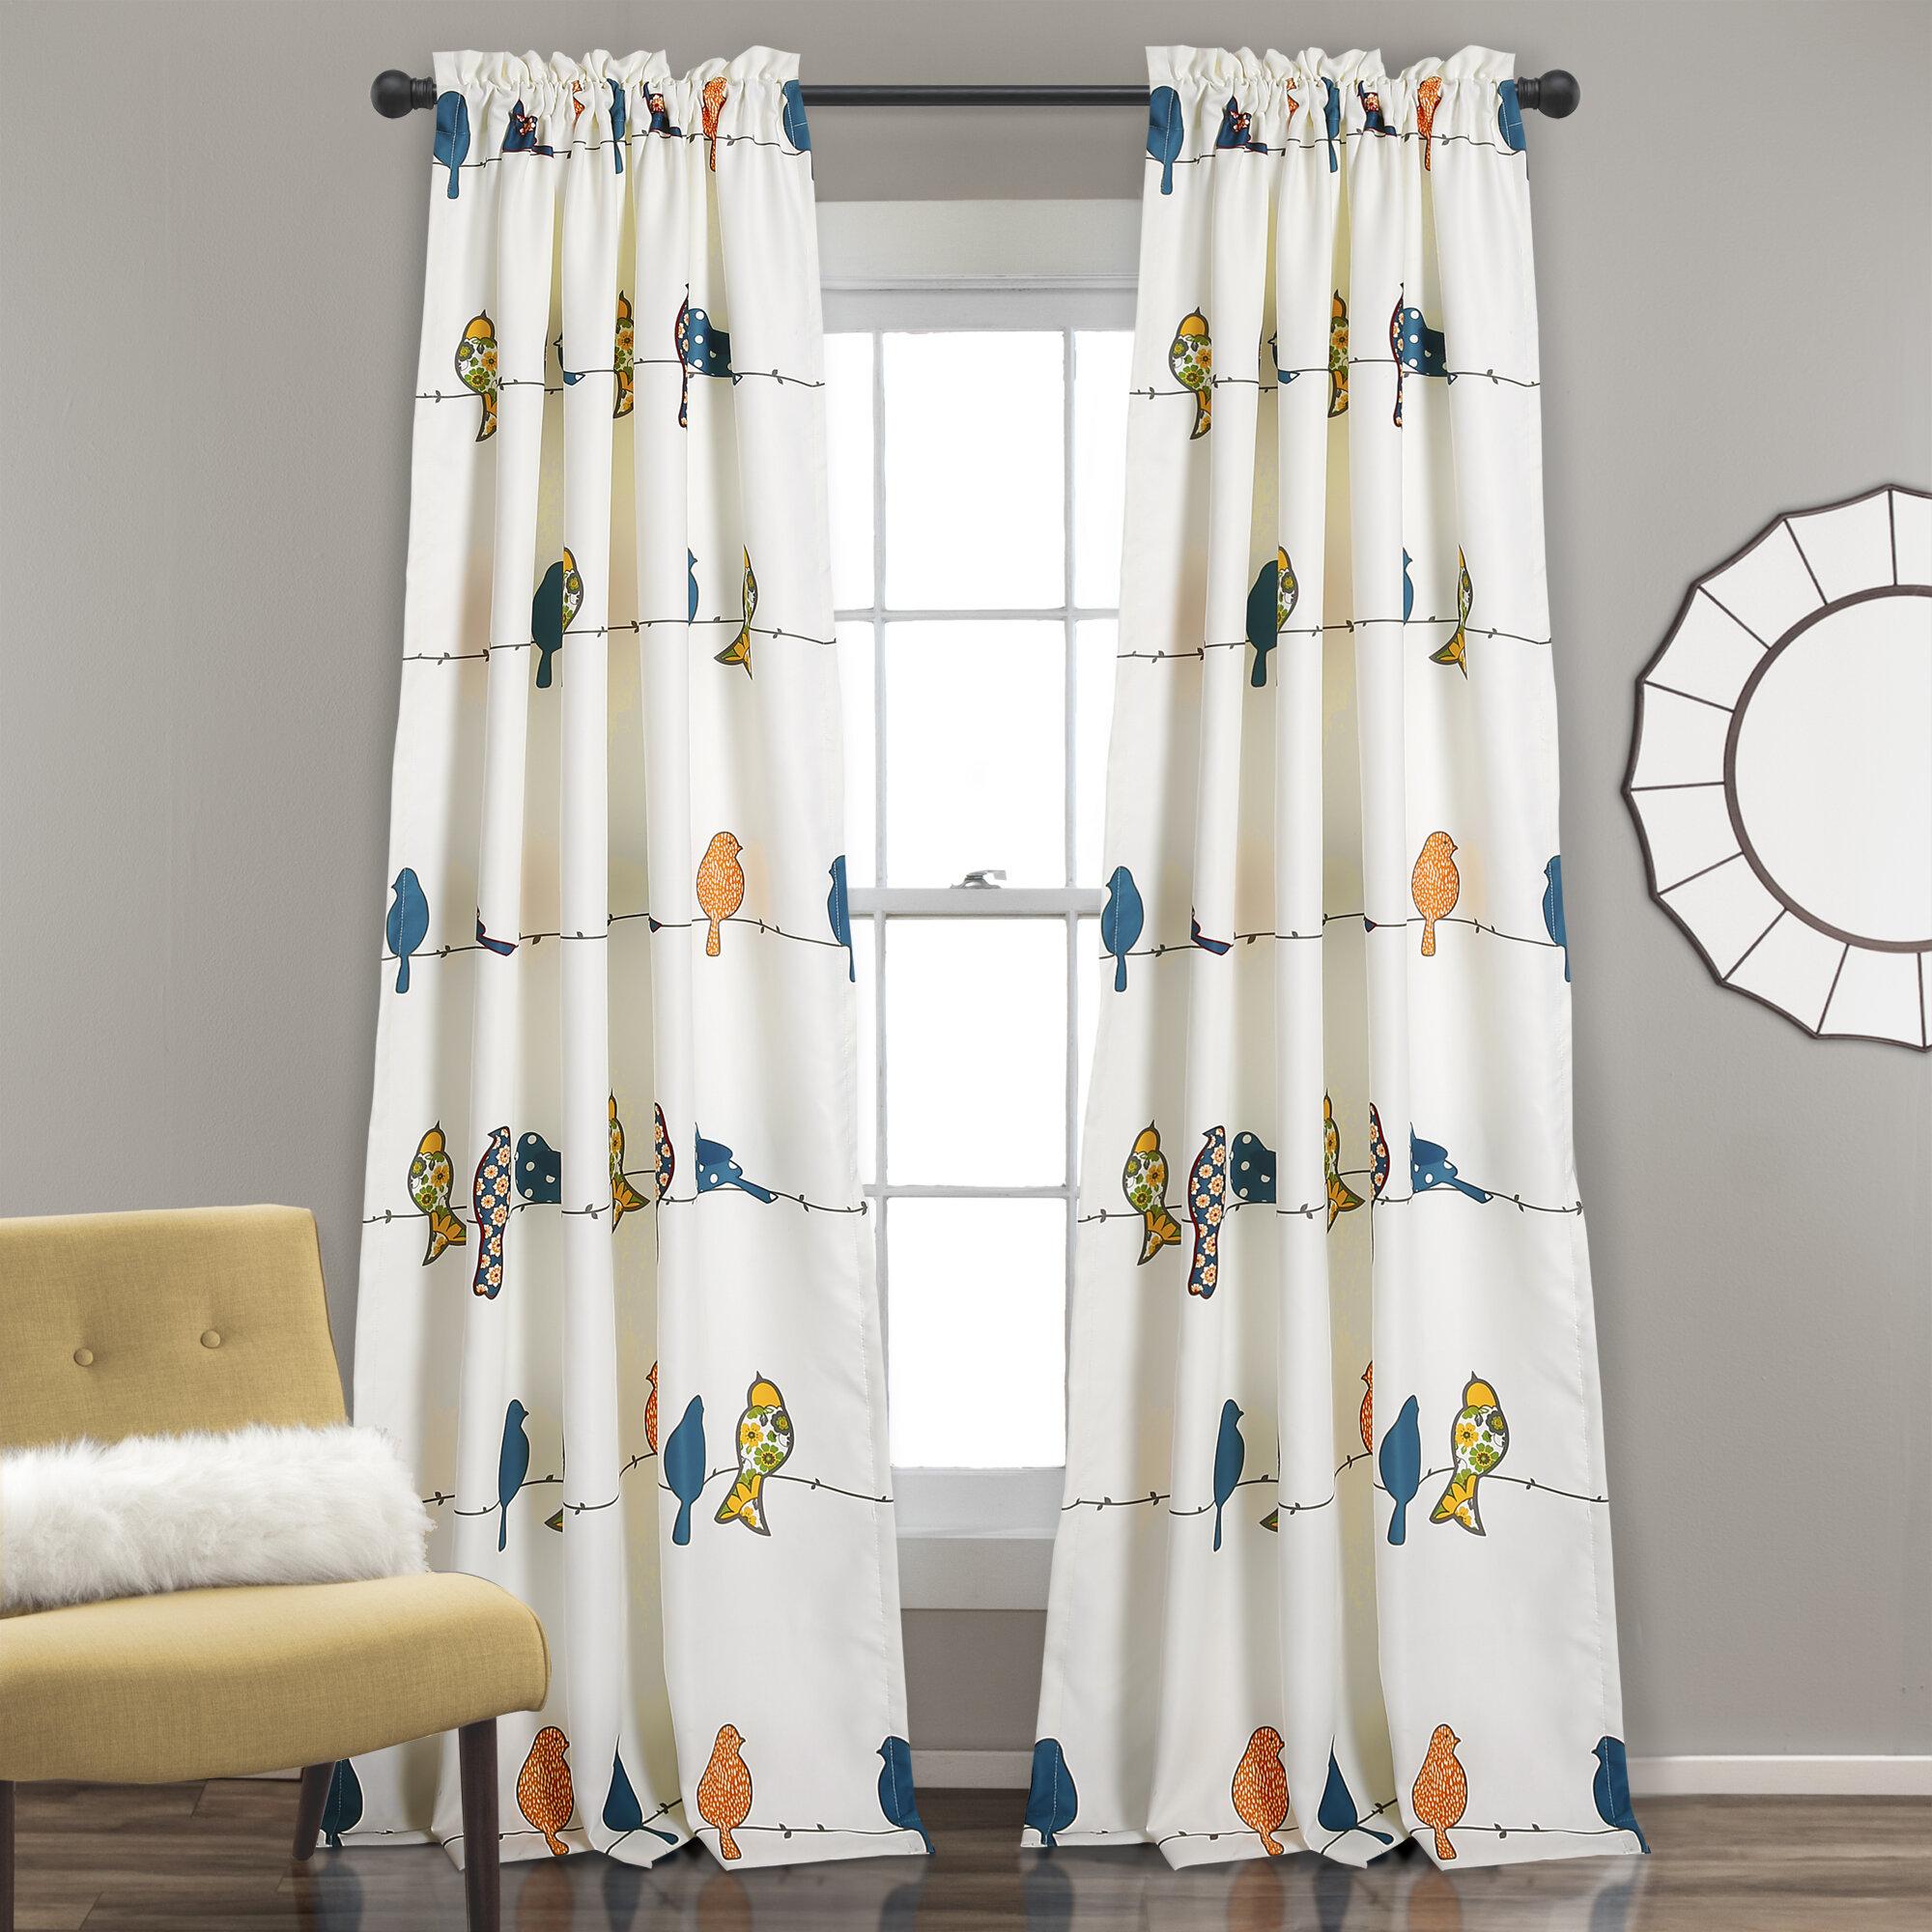 August Grove Recio Wildlife Room Darkening Thermal Rod Pocket Curtain Panels Reviews